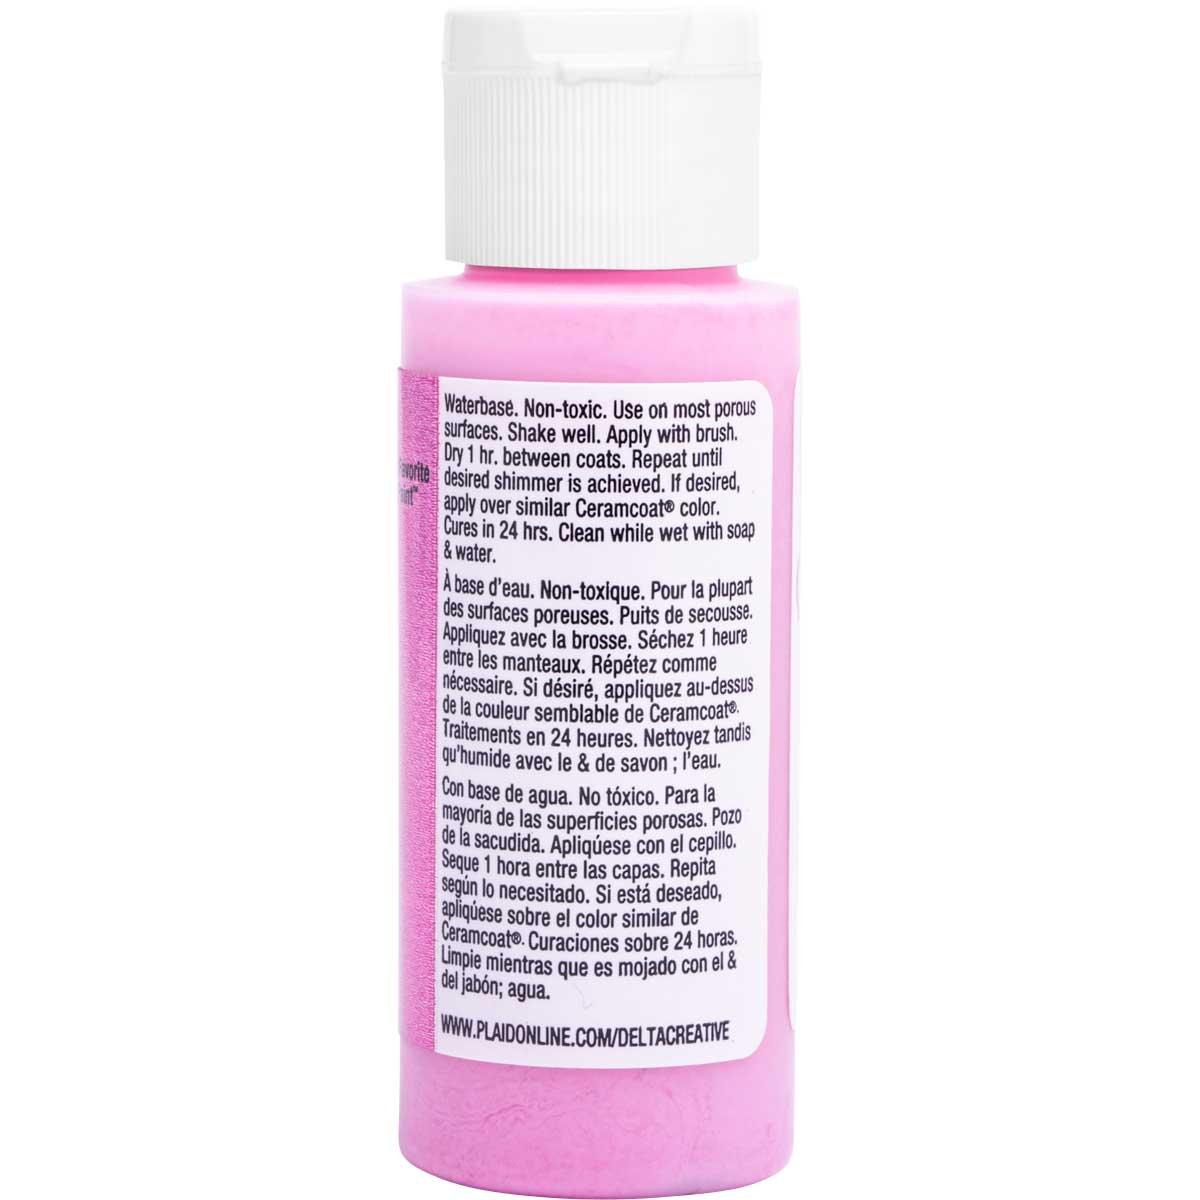 Delta Ceramcoat ® Acrylic Paint - Glitter Pink, 2 oz.